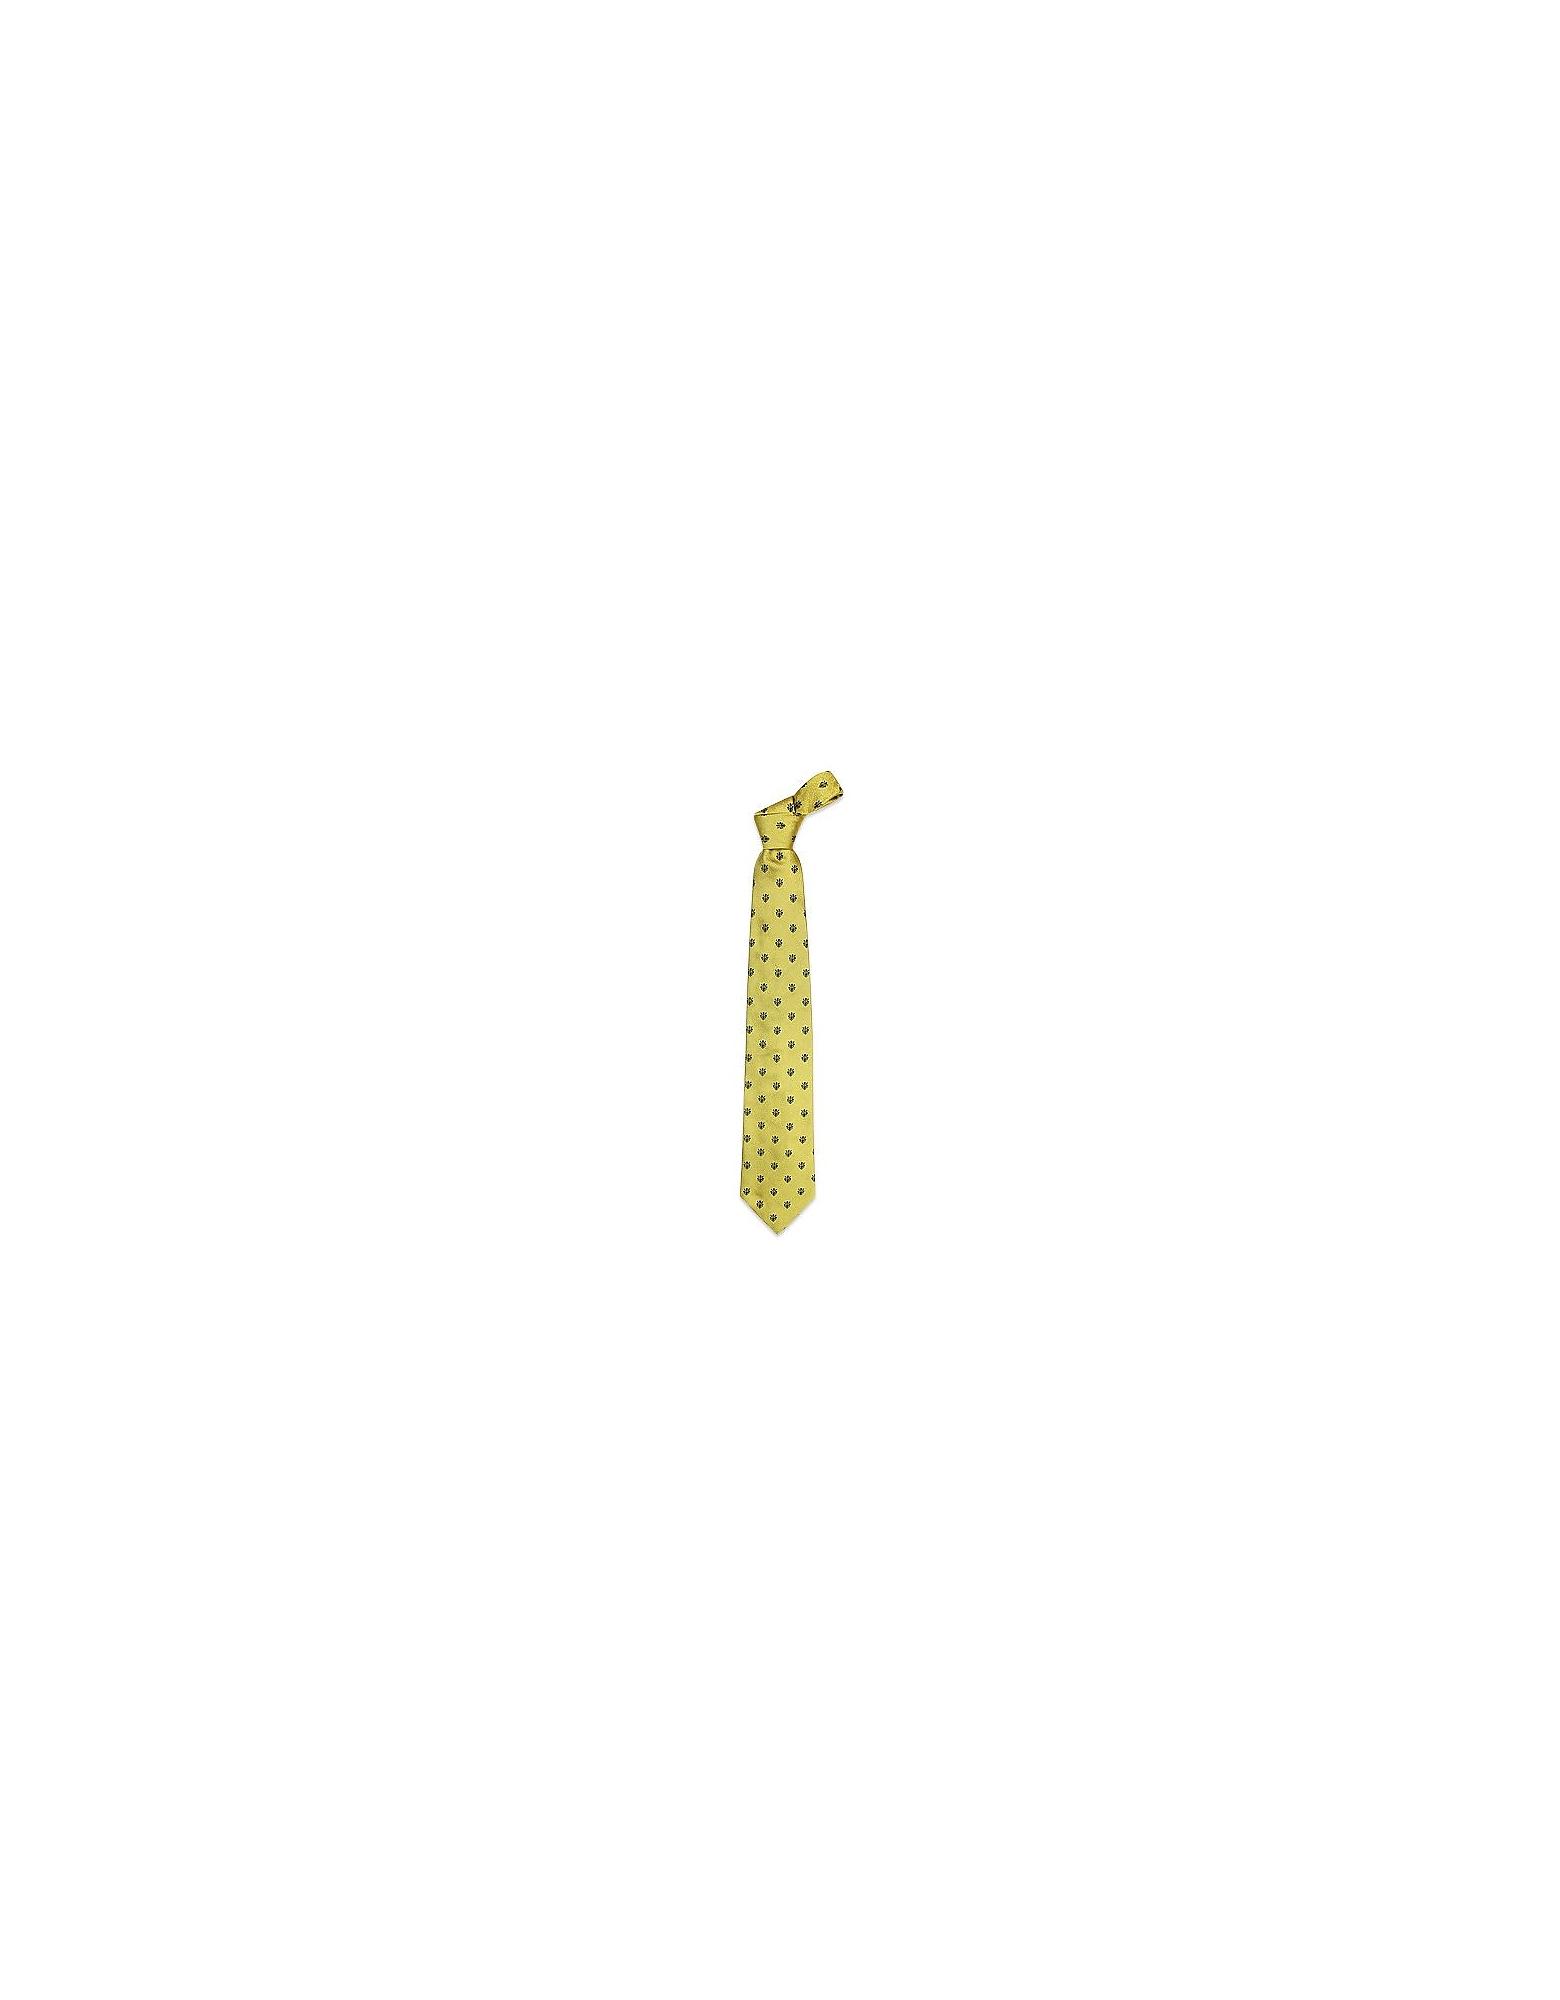 Forzieri Ties, Gold Line - Florentine Fleurs-de-Lis Woven Silk Tie